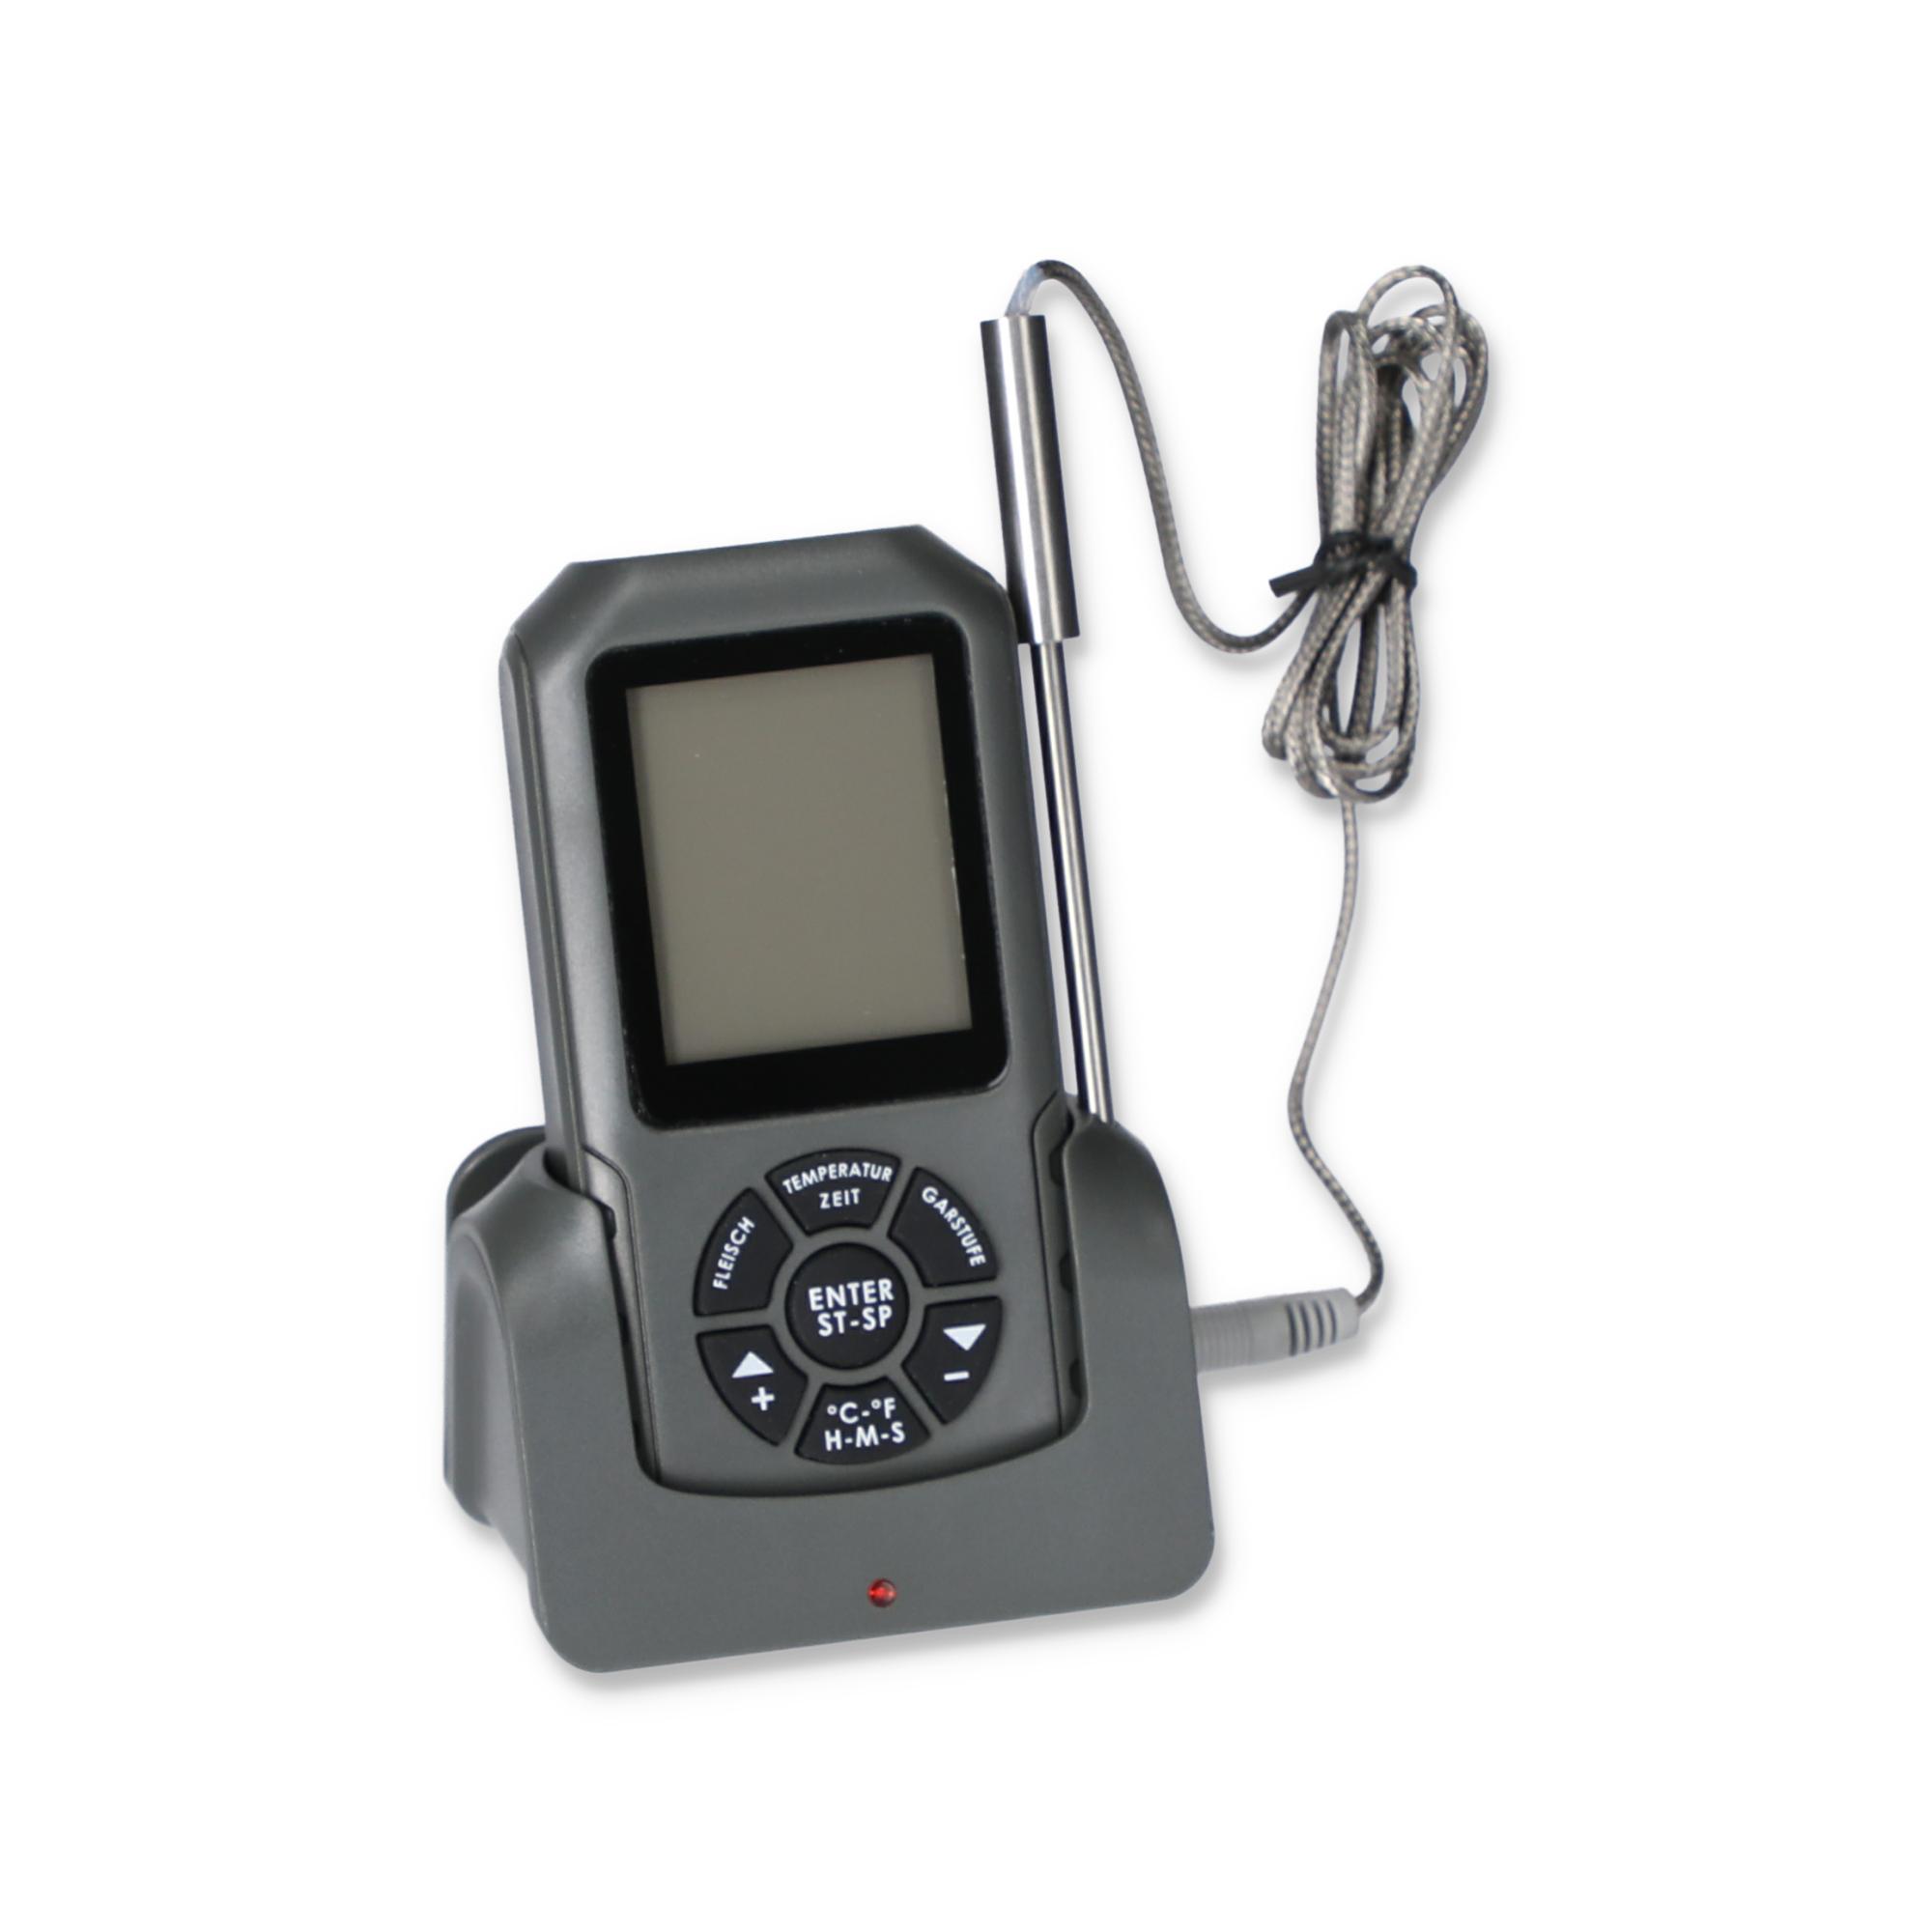 toom Grillthermometer digital schwarz 11 x 5,8 cm